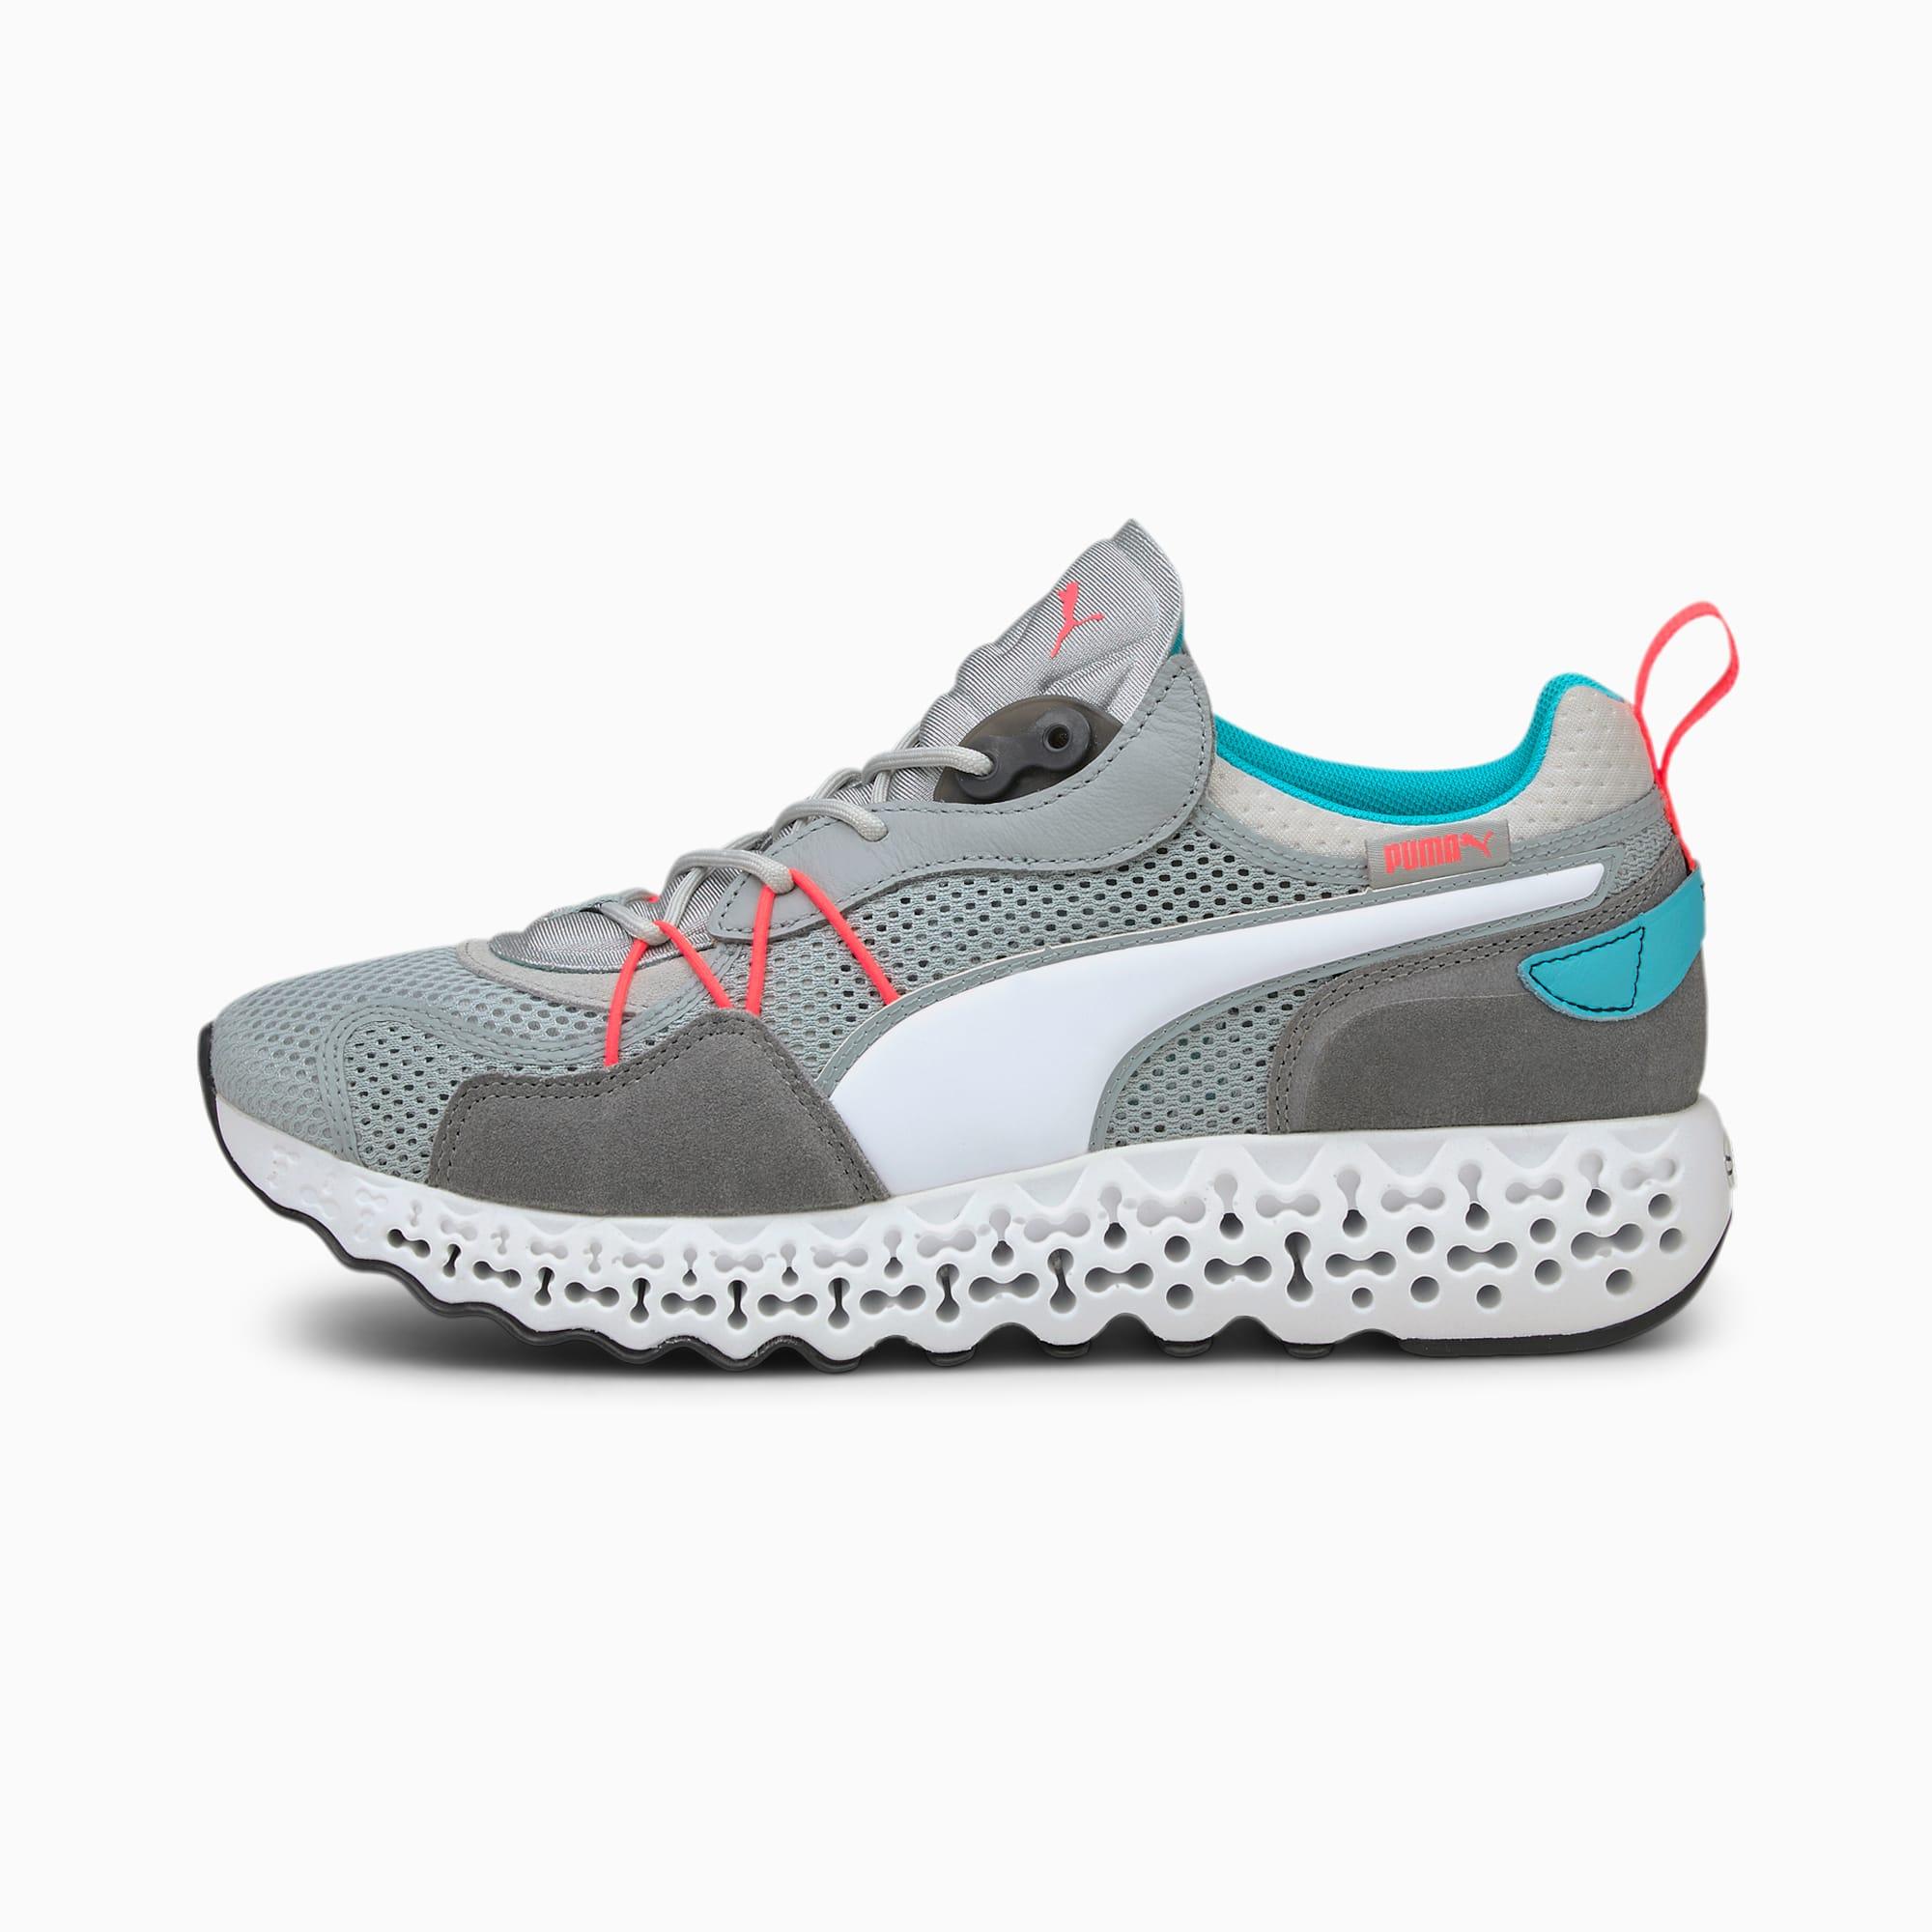 Calibrate Restored Tron Sneakers